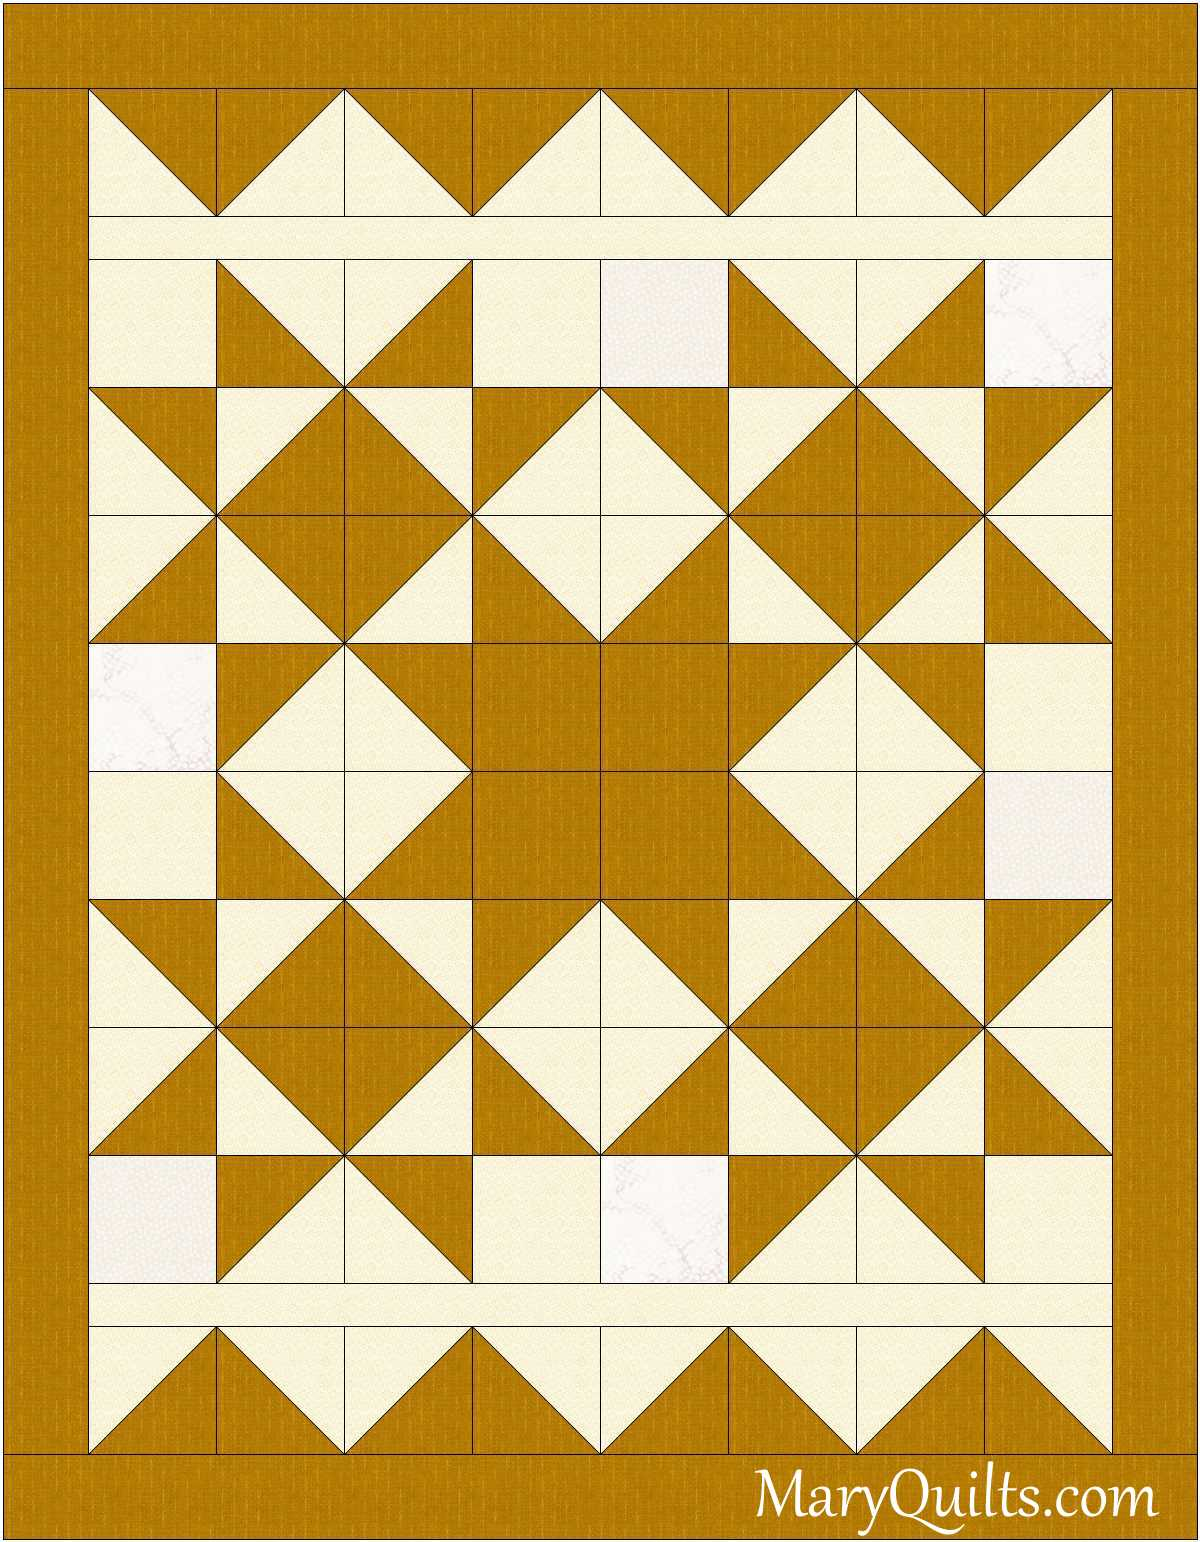 1-brown 5 stars